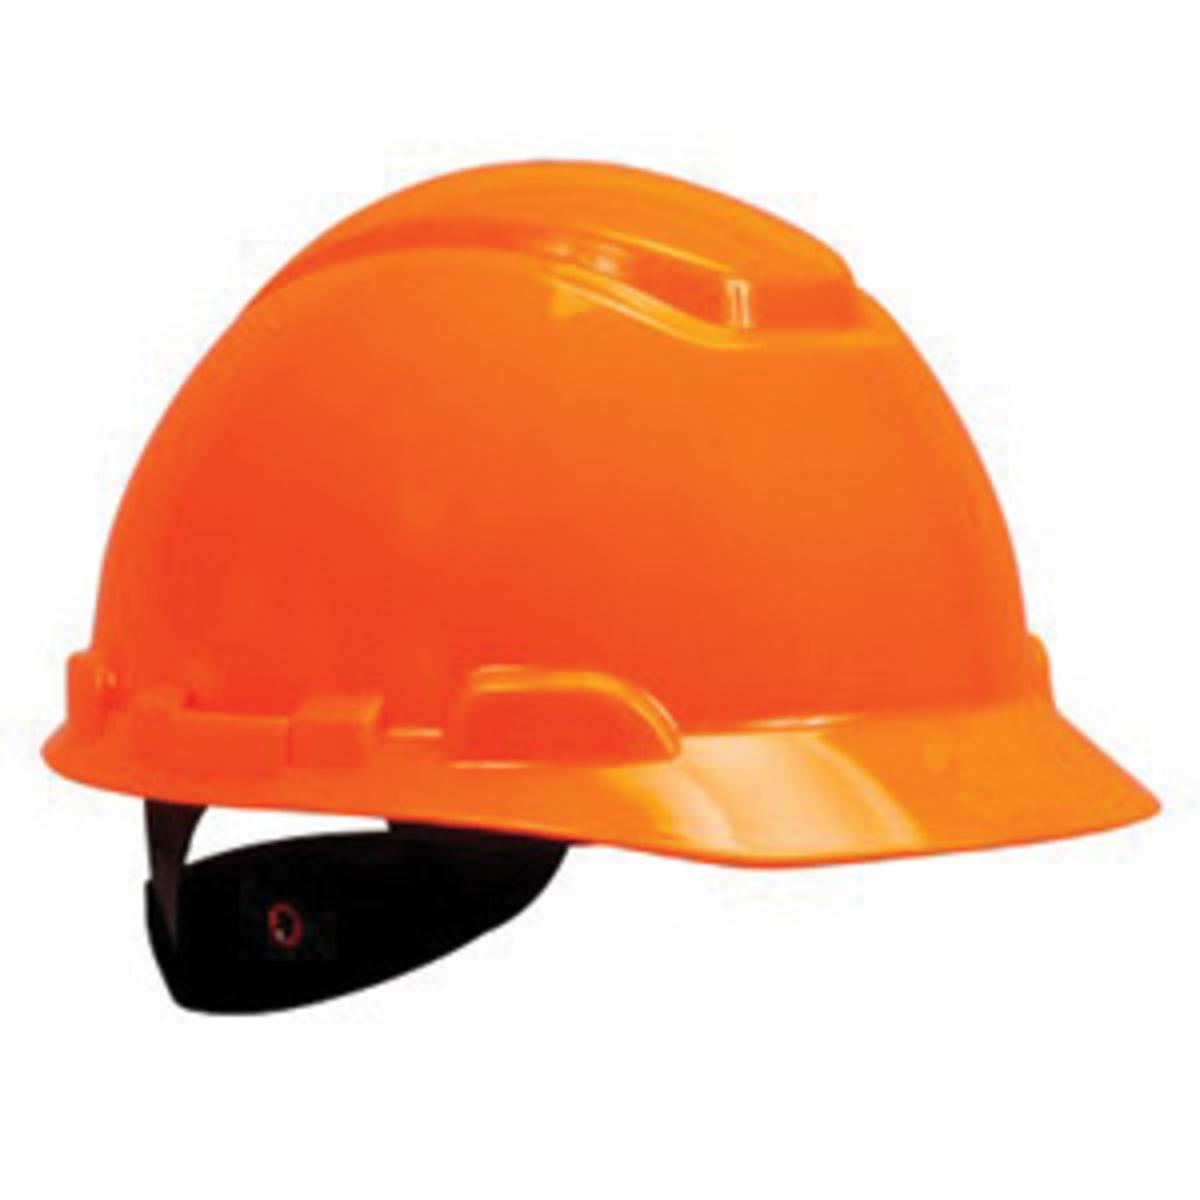 airgas 3mrh 707r uv 3m hi viz orange hdpe cap style hard hat with 4 point ratchet suspension. Black Bedroom Furniture Sets. Home Design Ideas